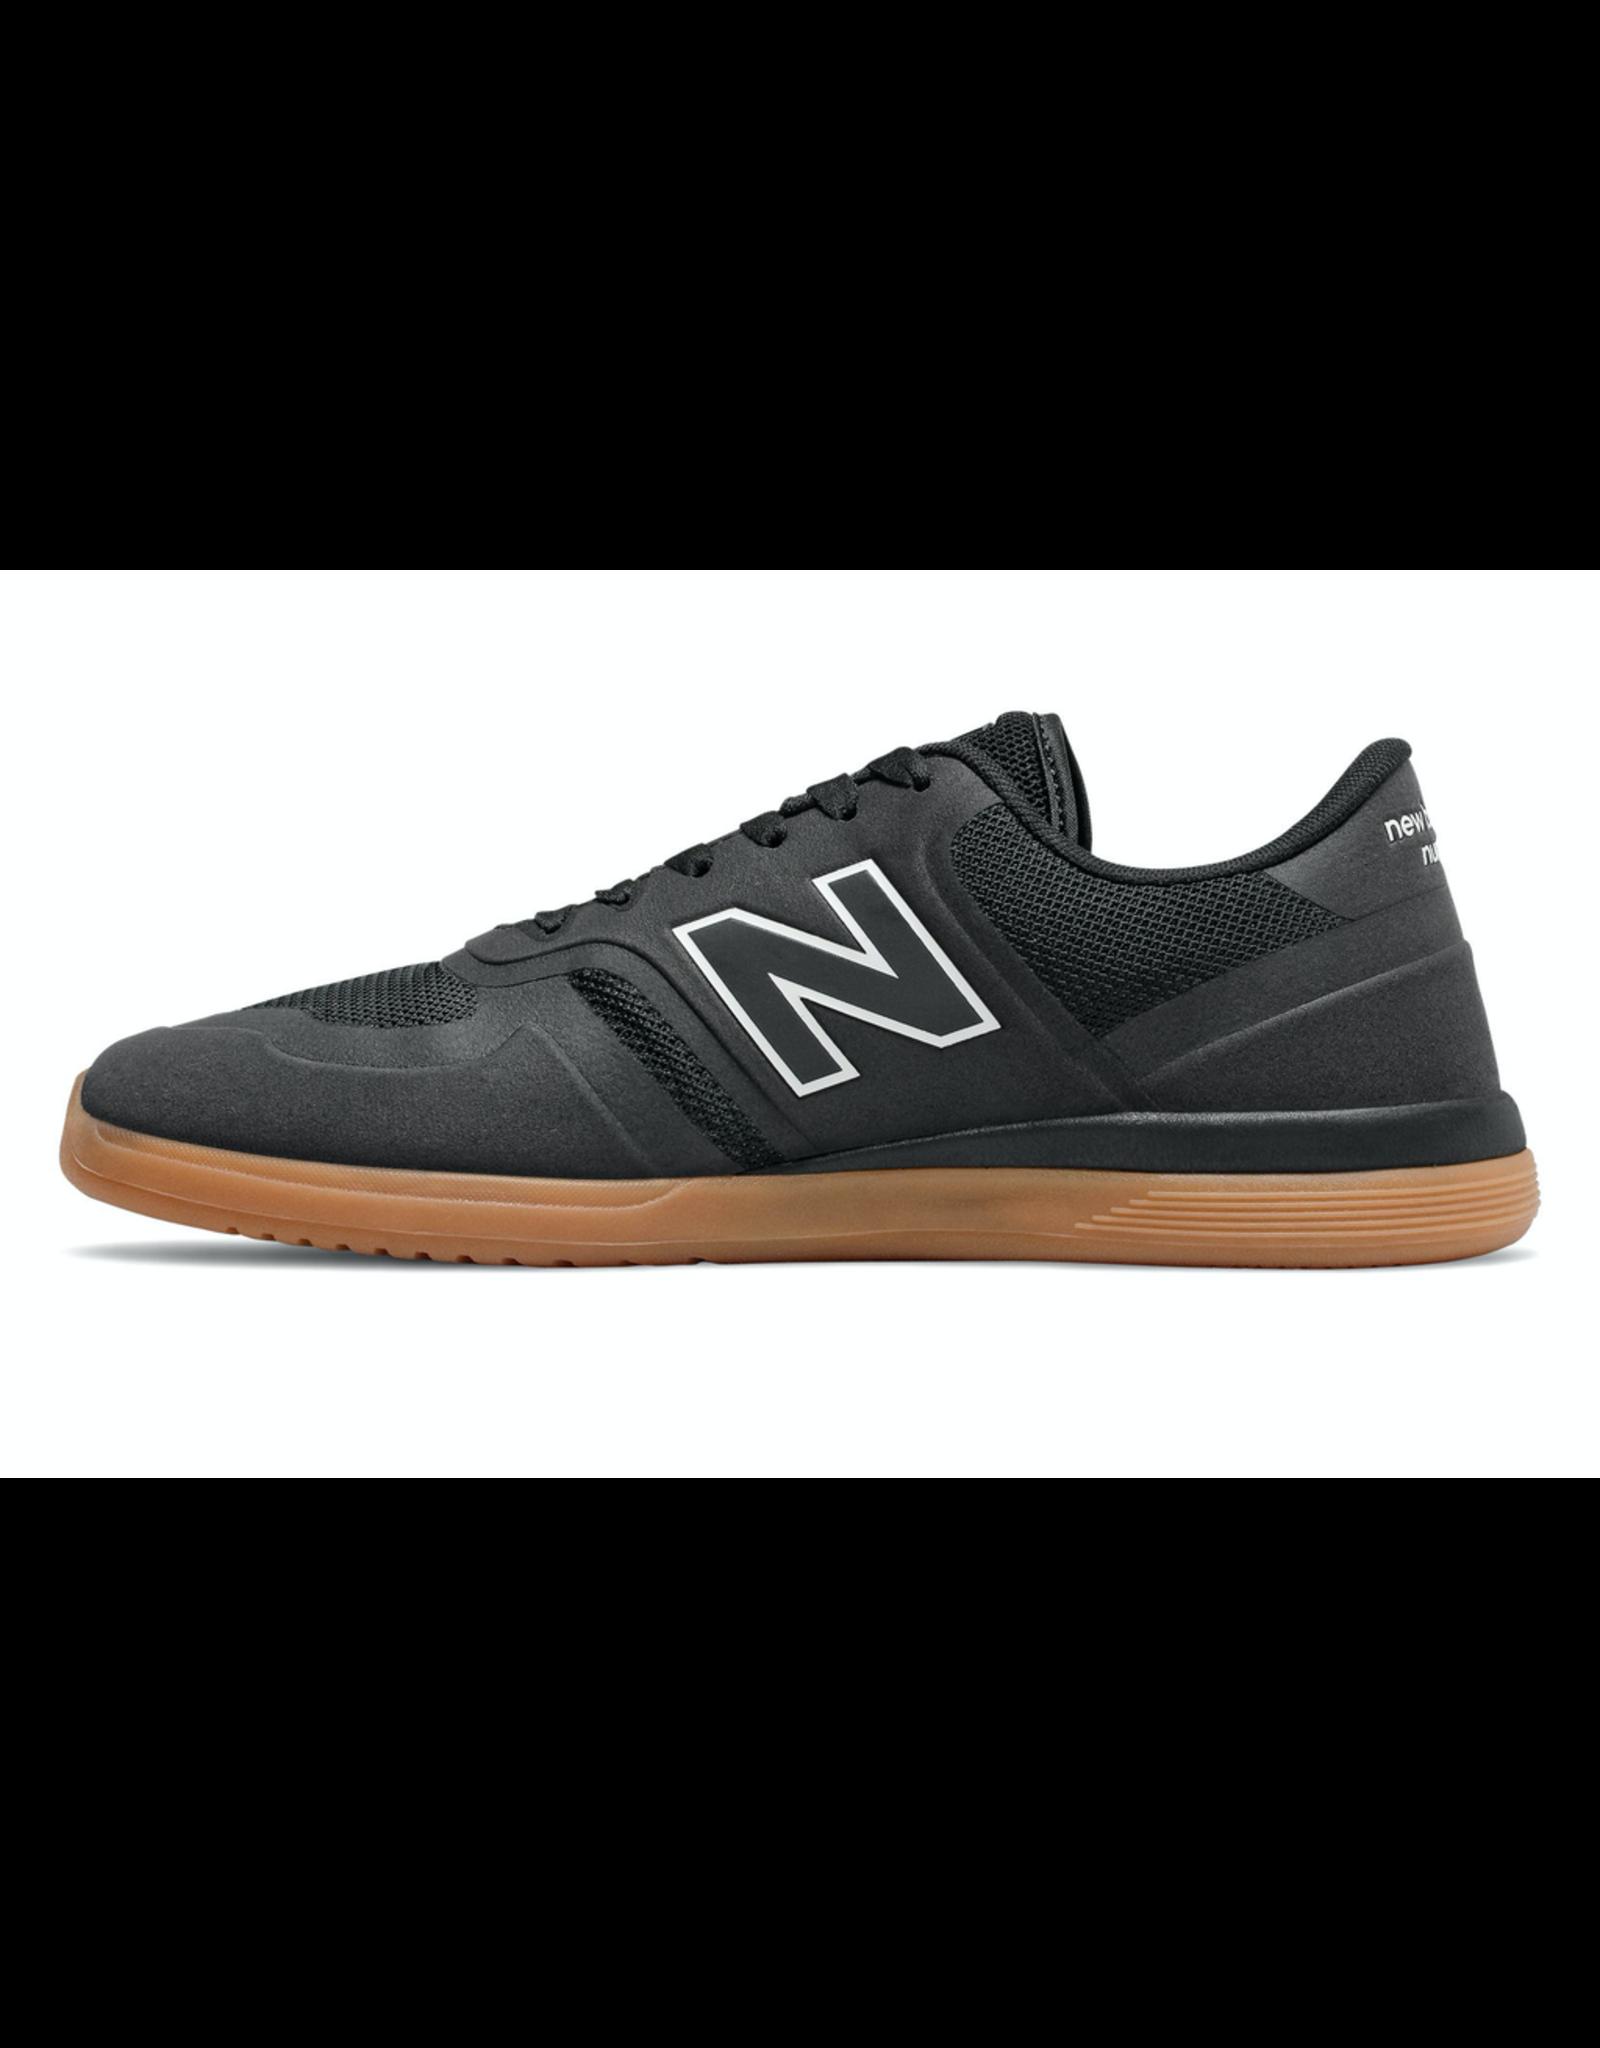 New Balance Numeric 420